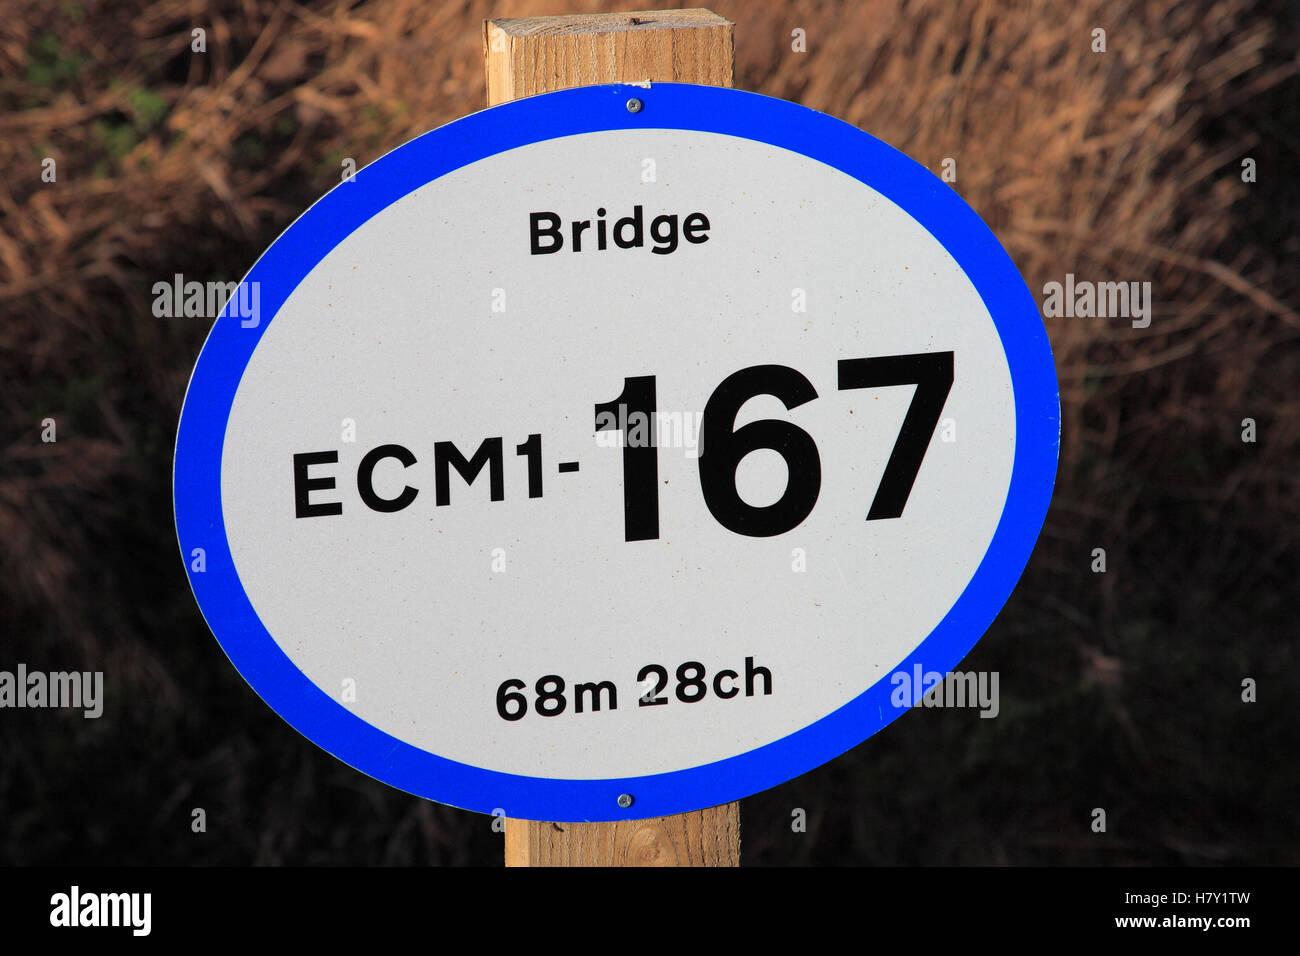 ECML bridge identification sign, East Coast Main Line Railway, Peterborough, Cambridgeshire, England, UK - Stock Image